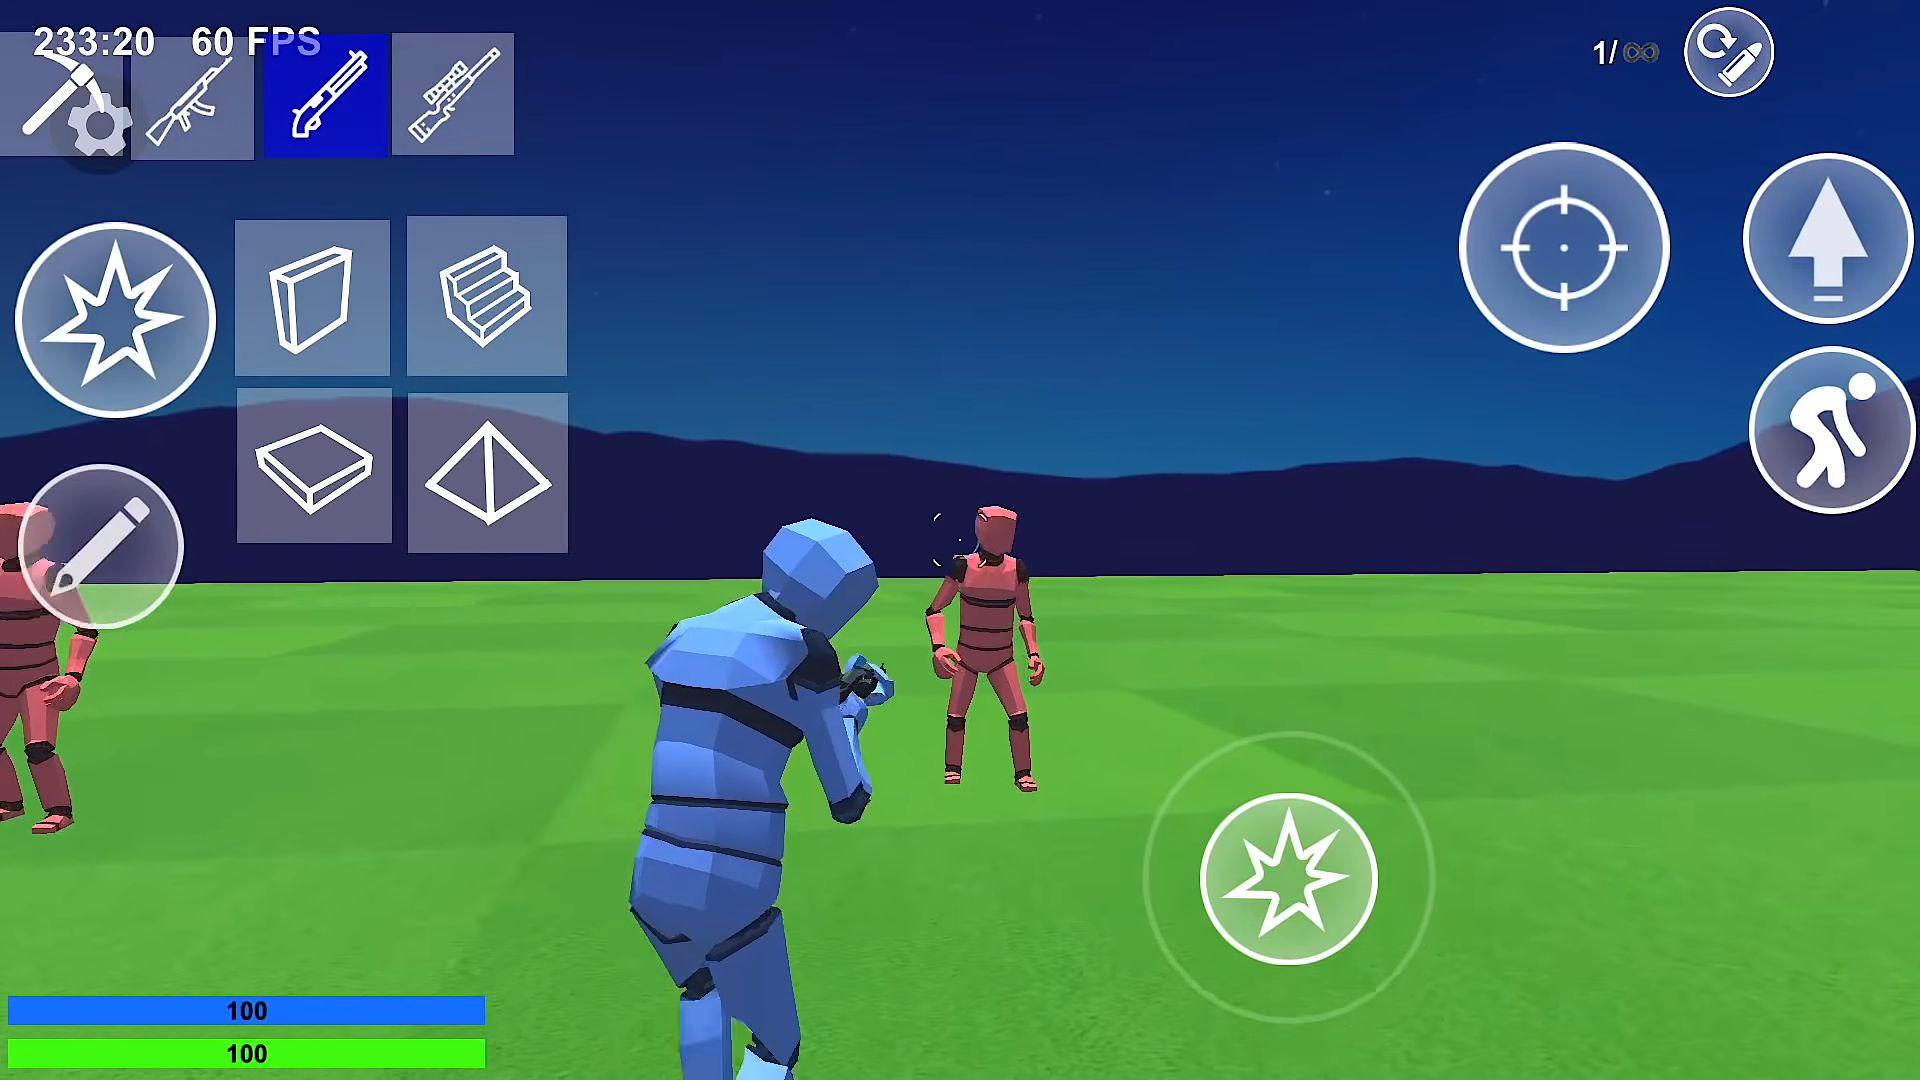 1v1.LOL - Online Building & Shooting Simulator screenshot 1